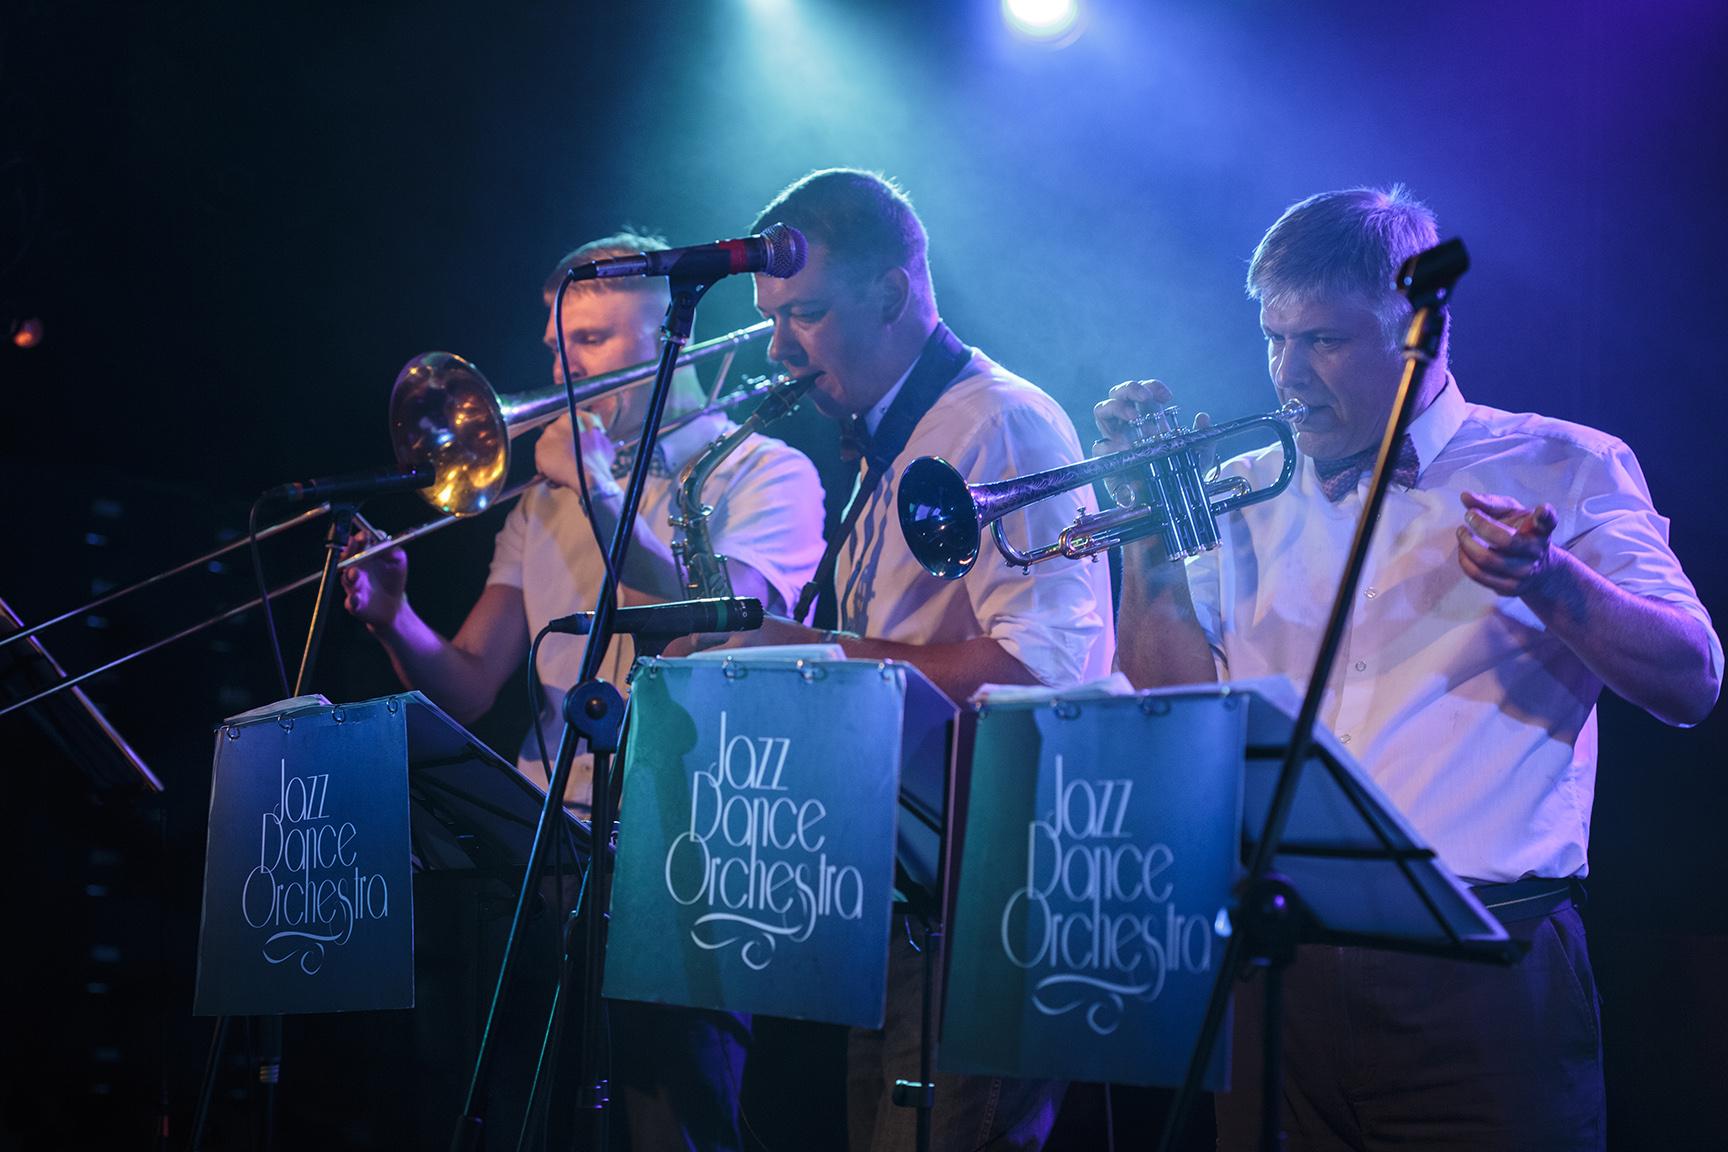 Фото Jazz Dance Orchestra ,